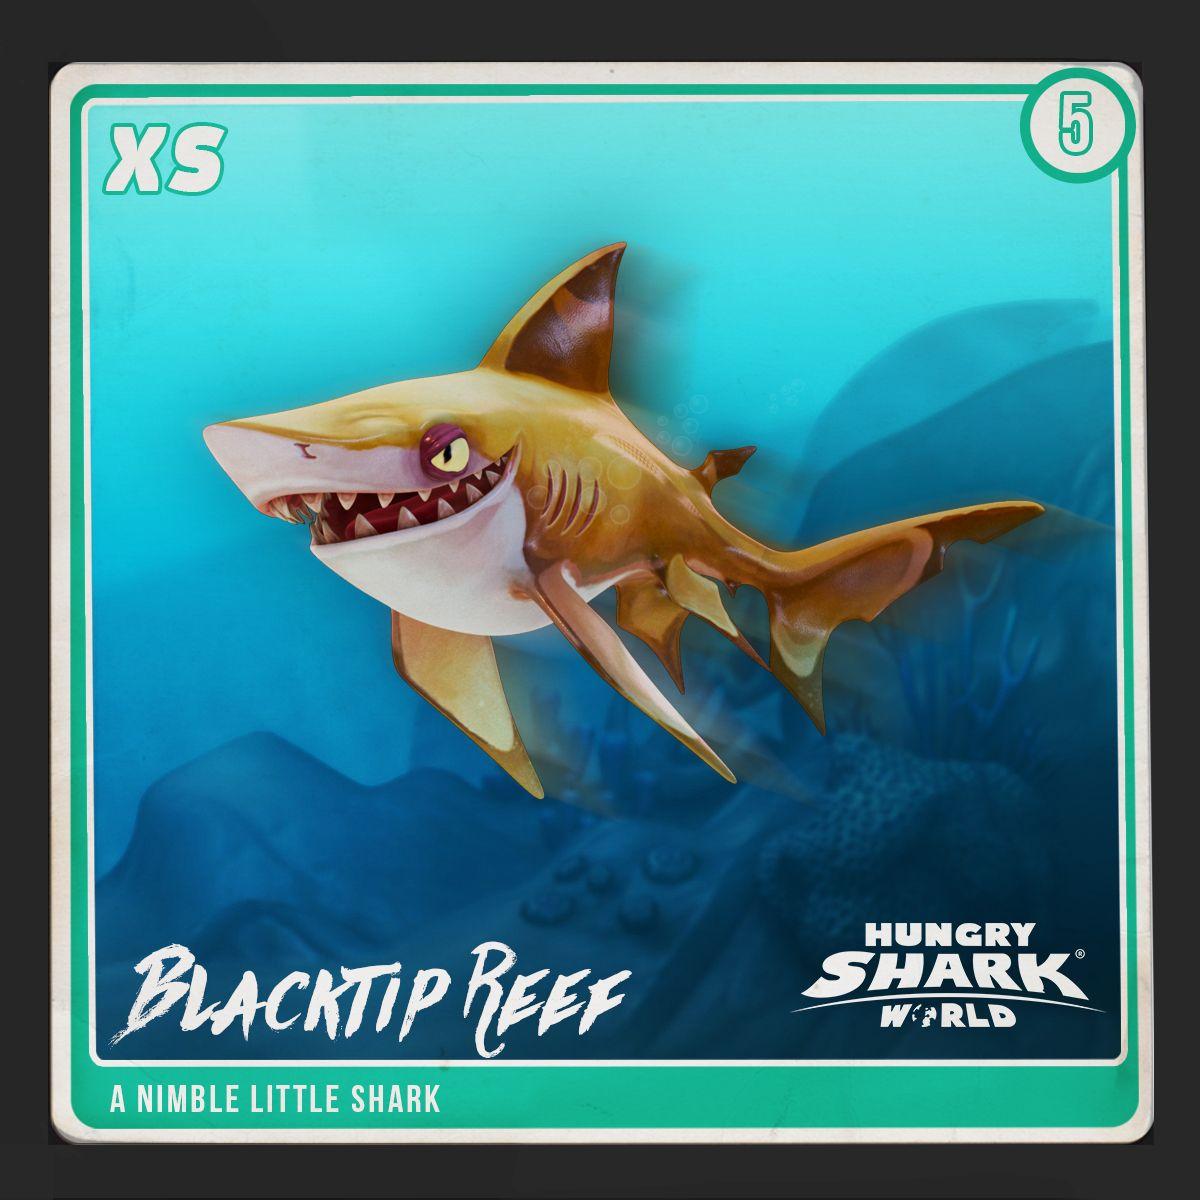 sharkarium card number 5! Blacktip reef! Shark, Shark